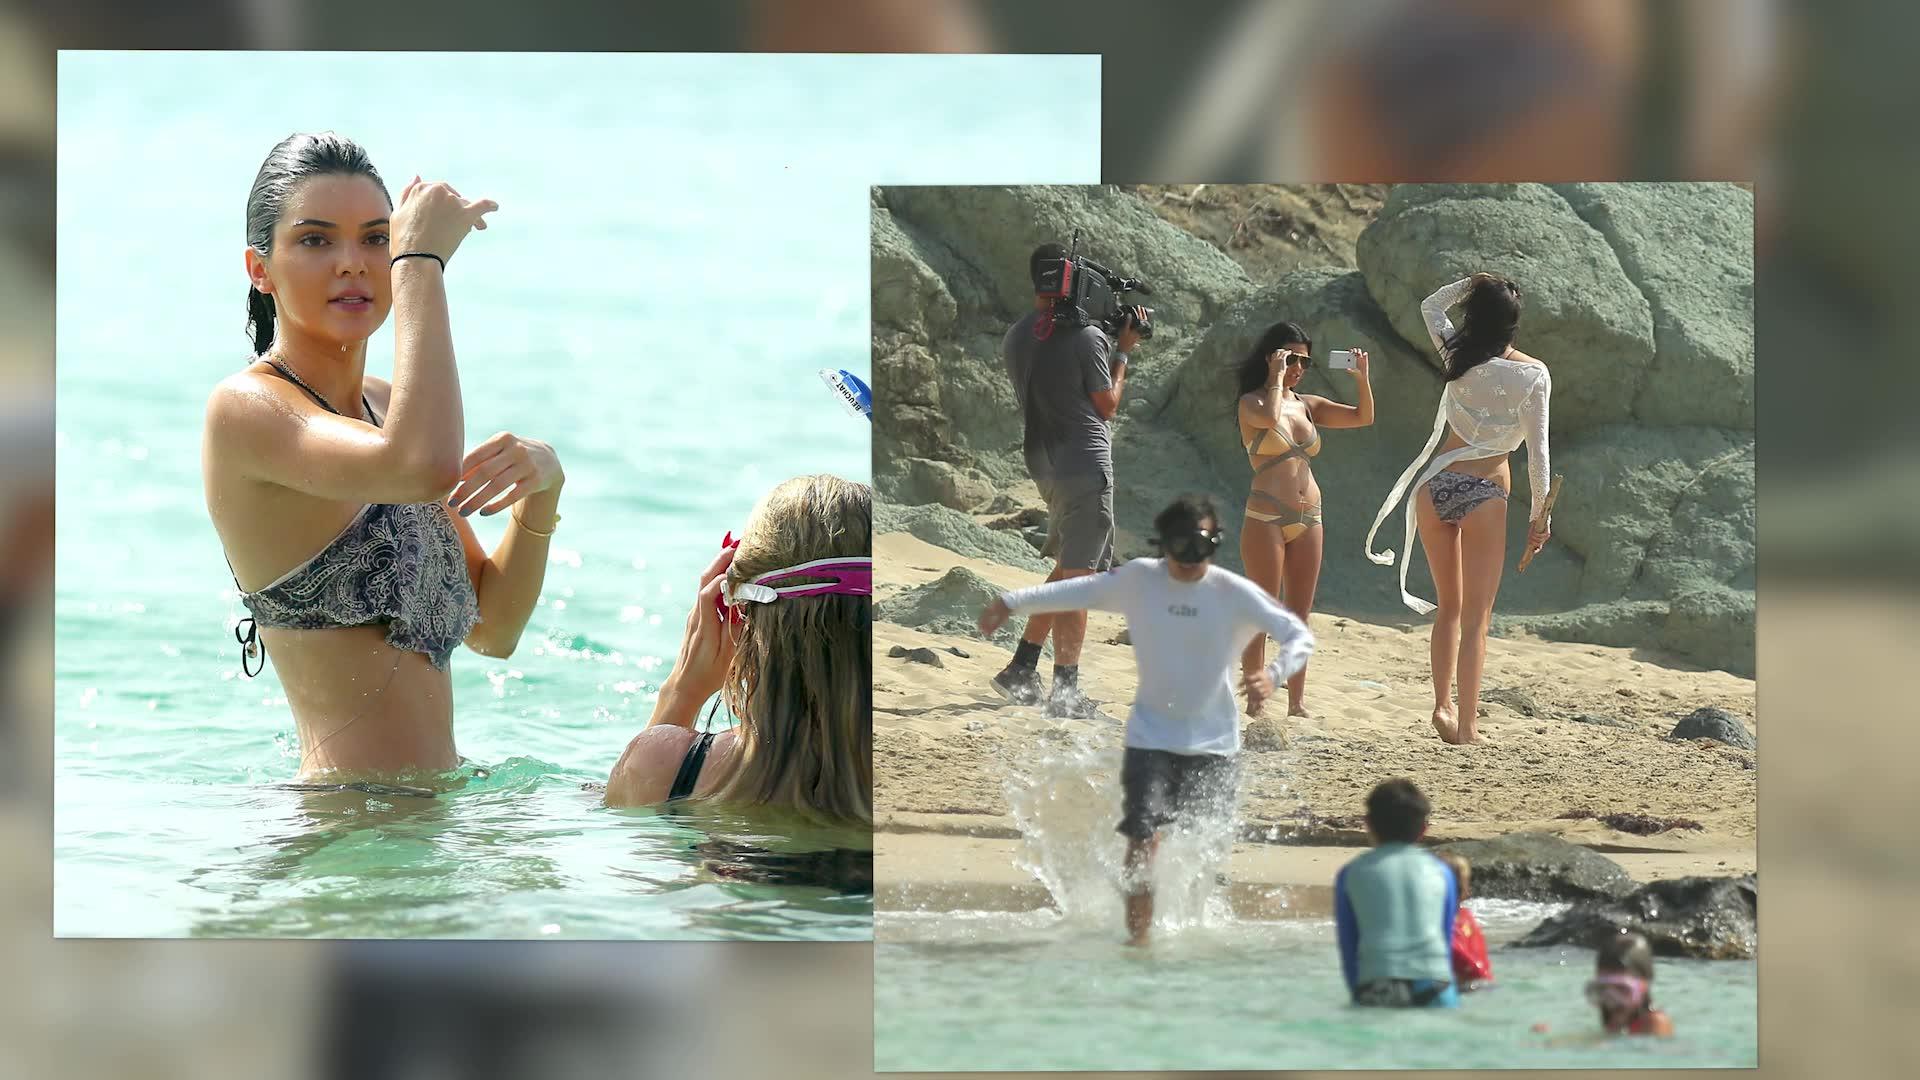 Bikini Clad Kendall Jenner Shows Off Her Paddle Boarding Skills